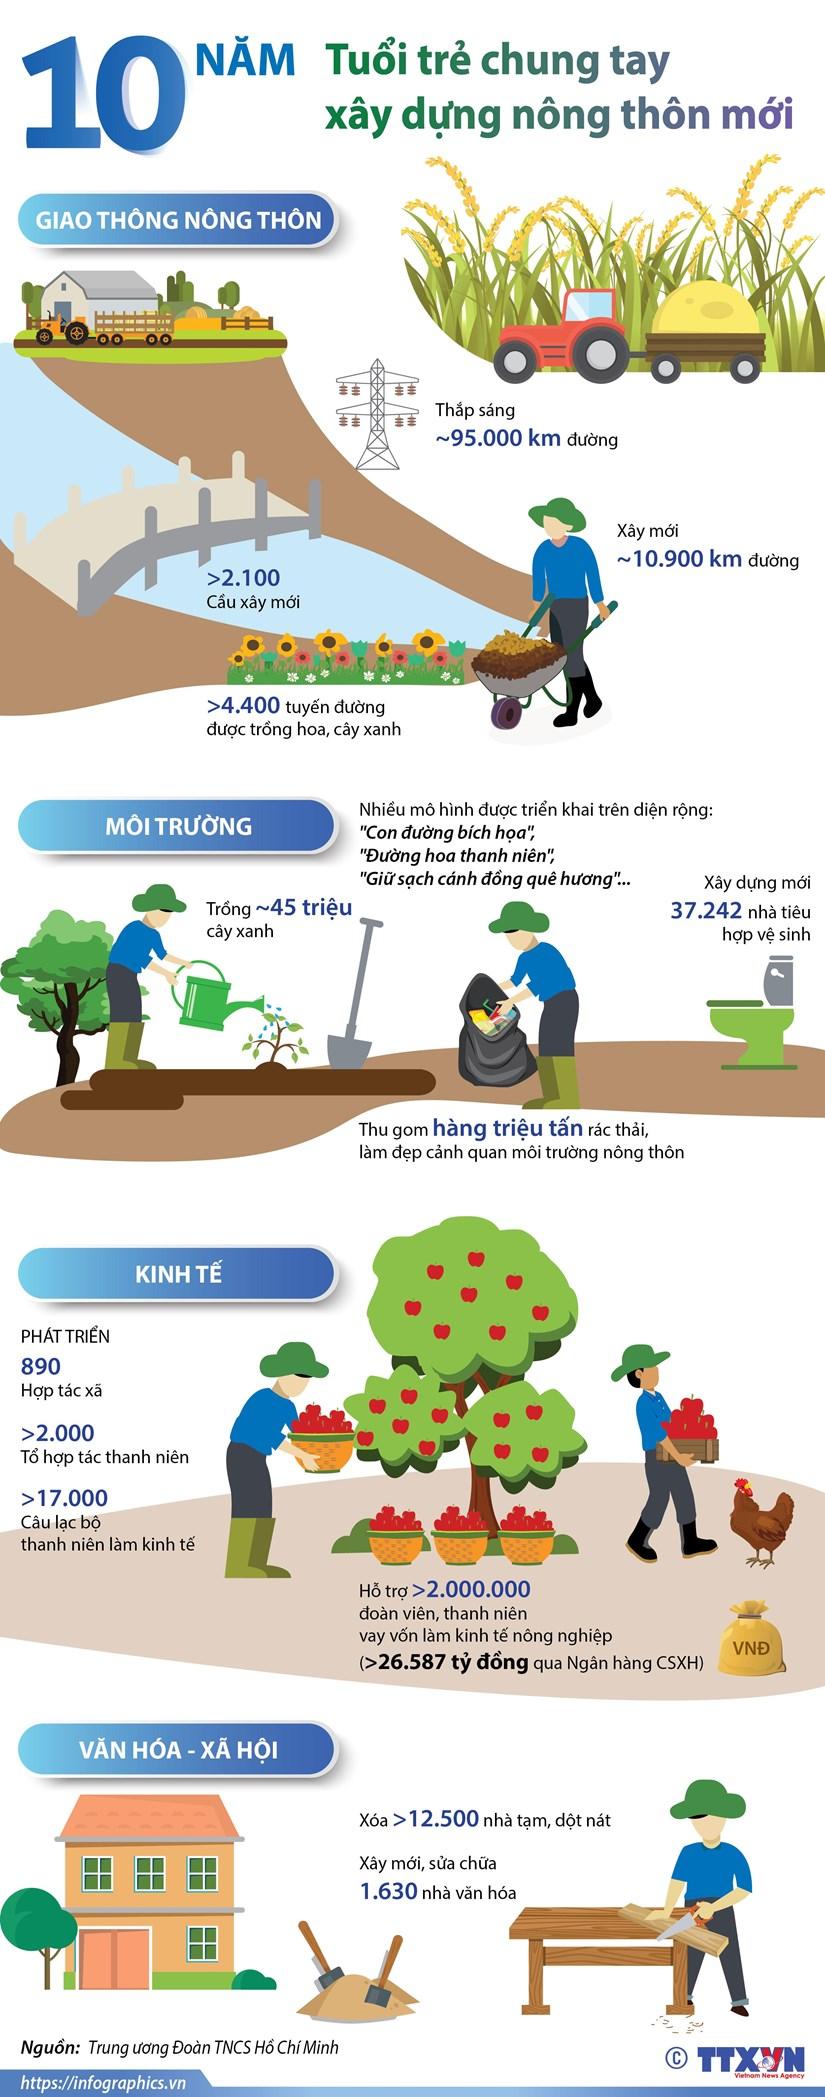 [Infographics] 10 nam tuoi tre chung tay xay dung nong thon moi hinh anh 1